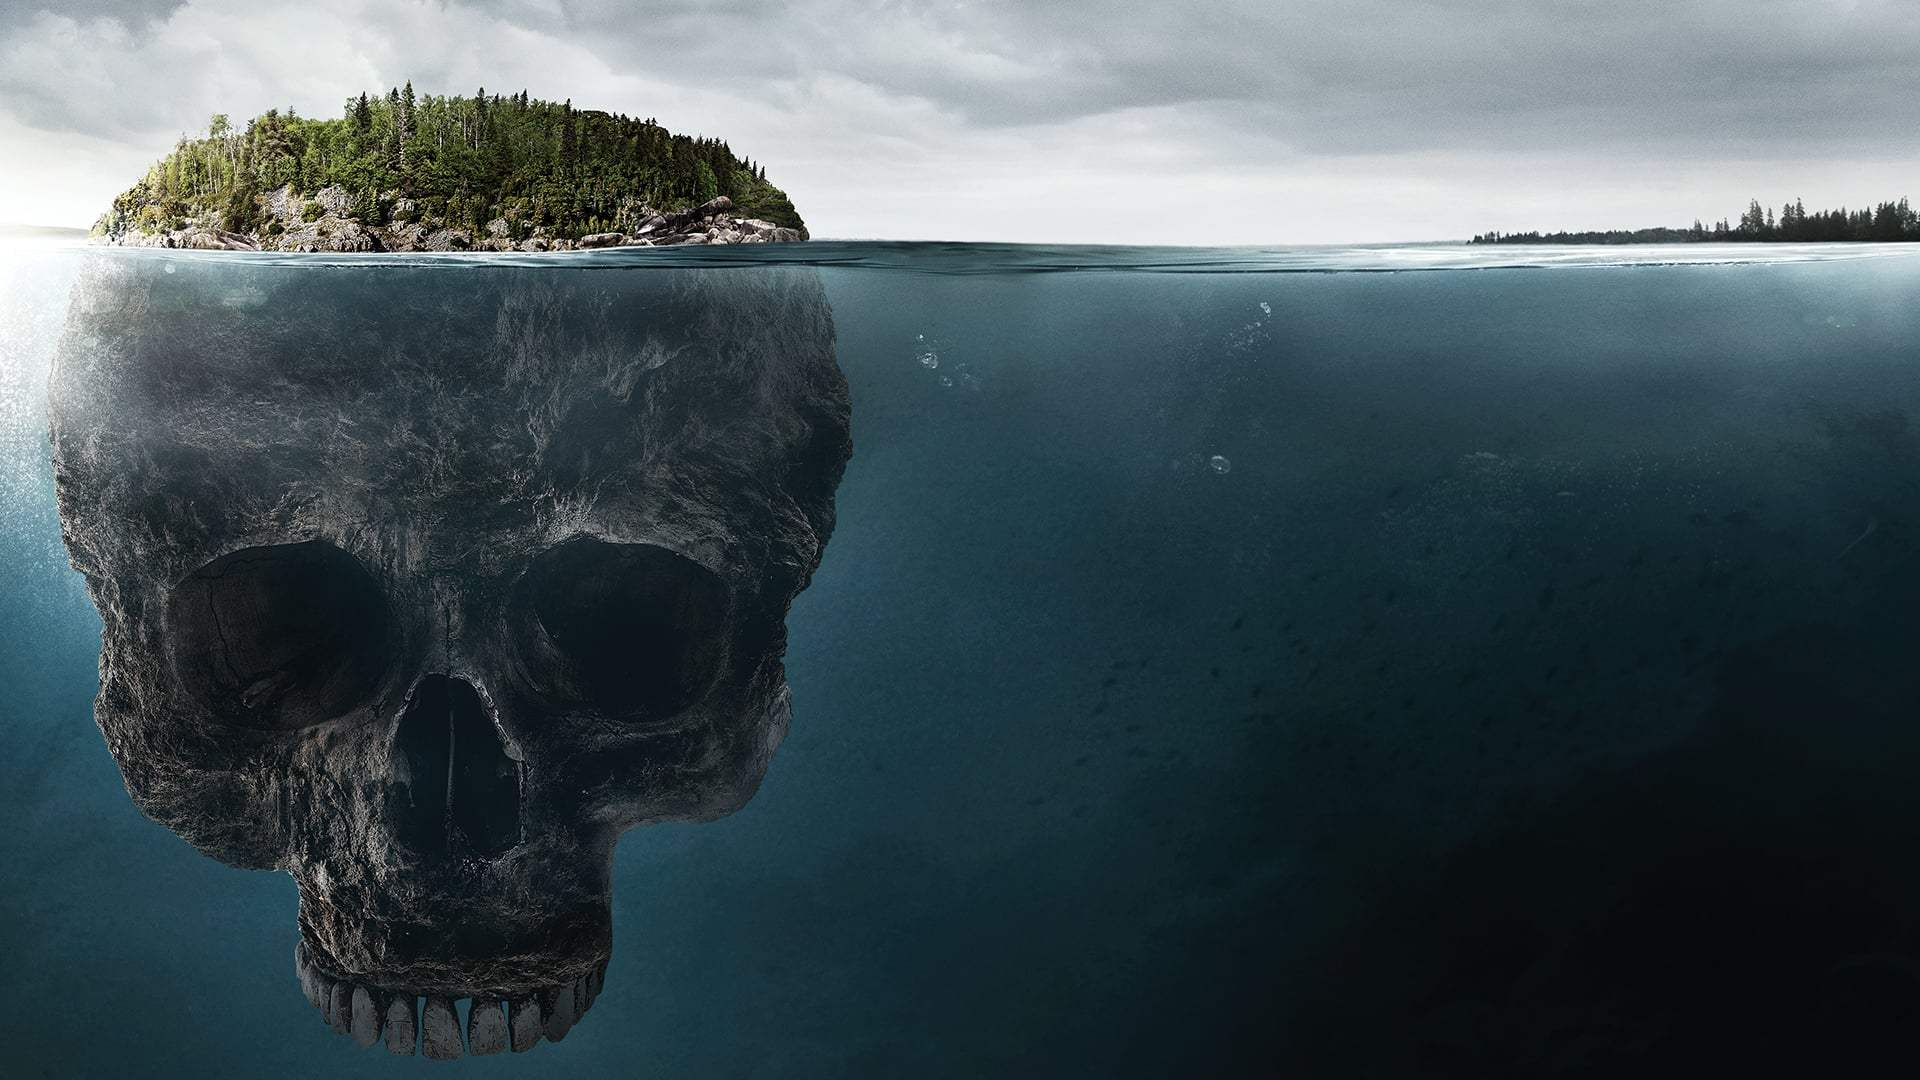 720p~ The Curse of Oak Island Season 7 Episode 8 release date?